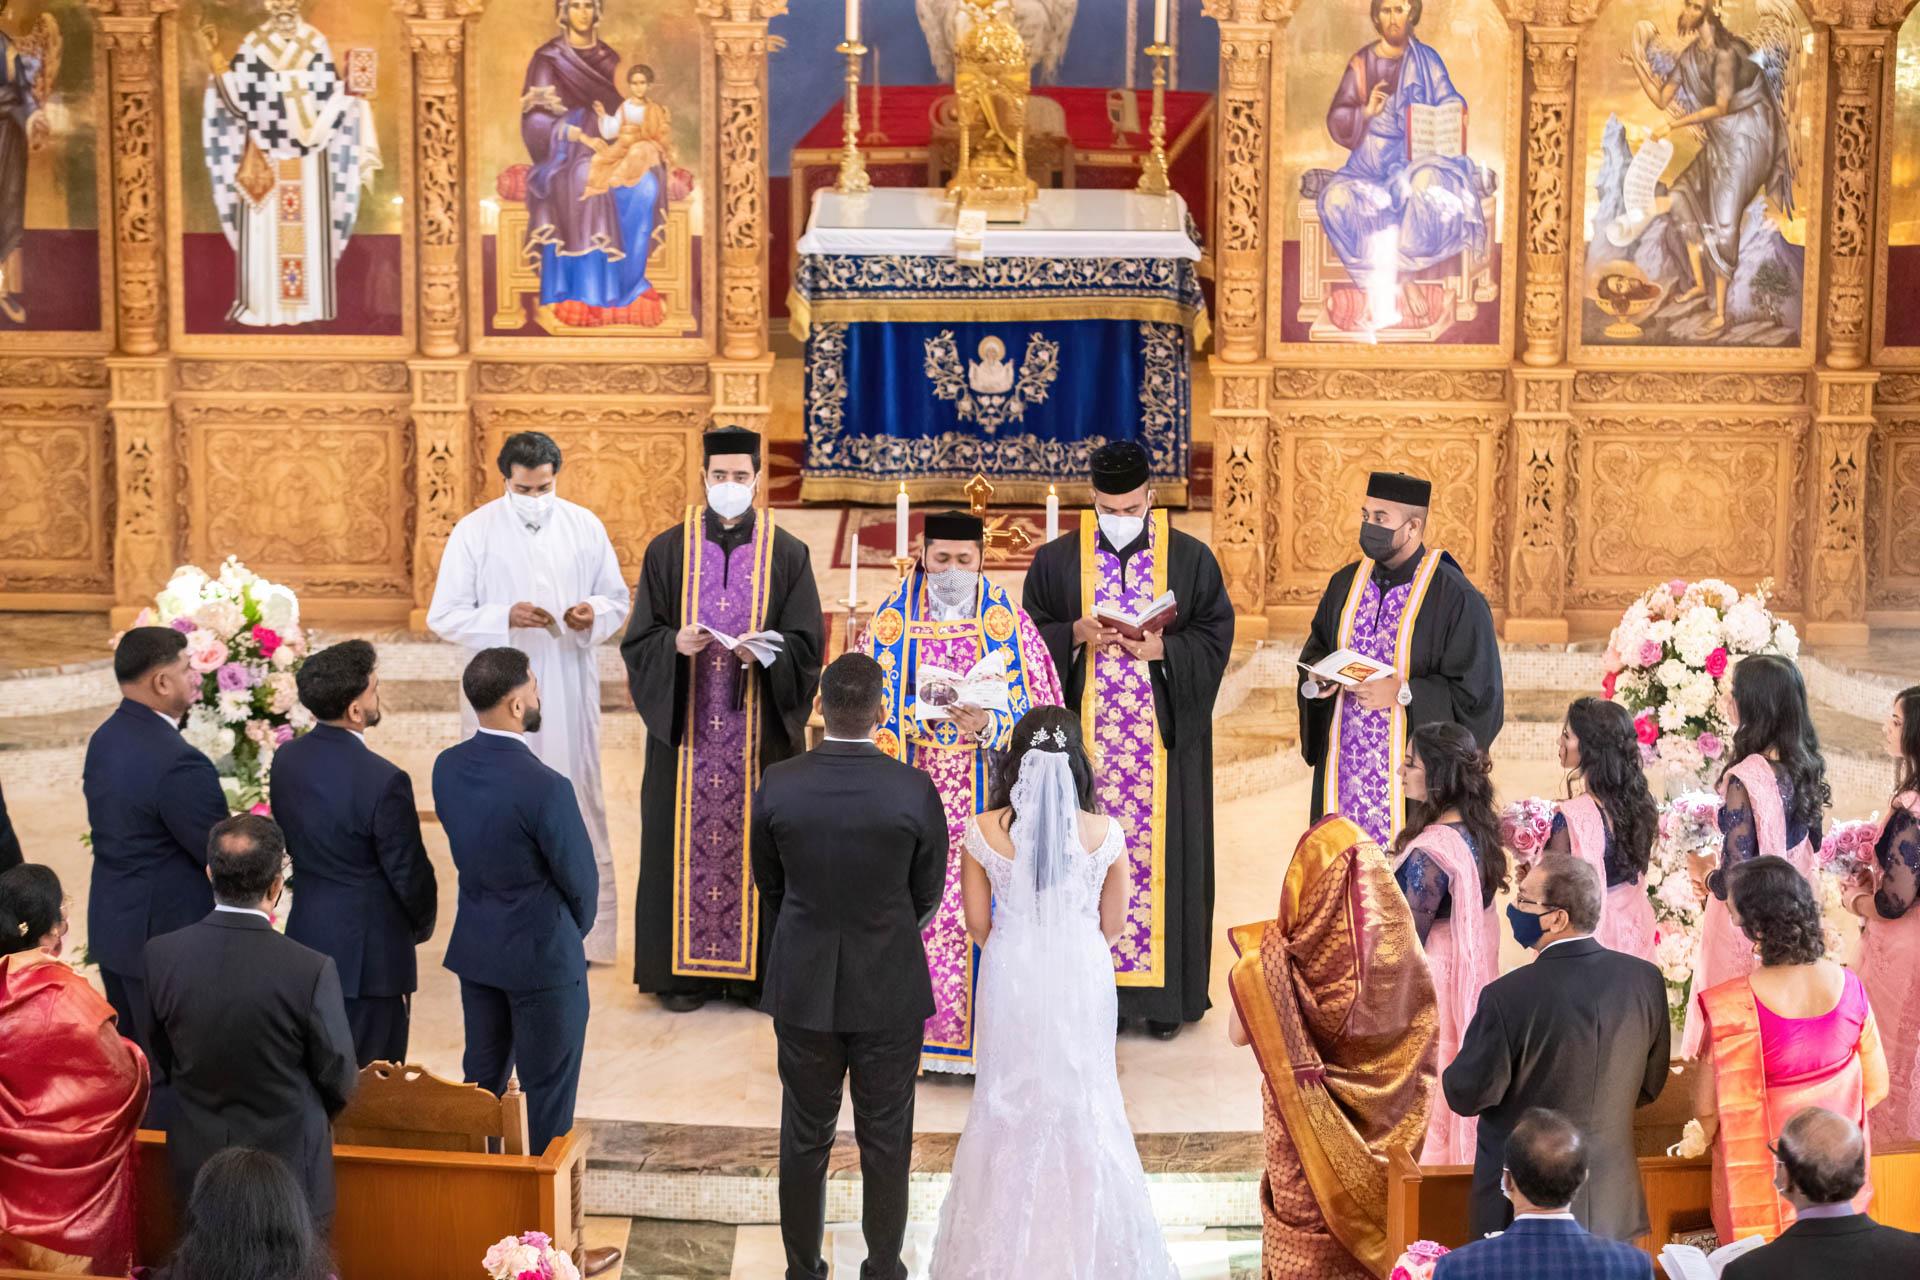 WESTMOUNT COUNTRY CLUB INDIAN WEDDING 11